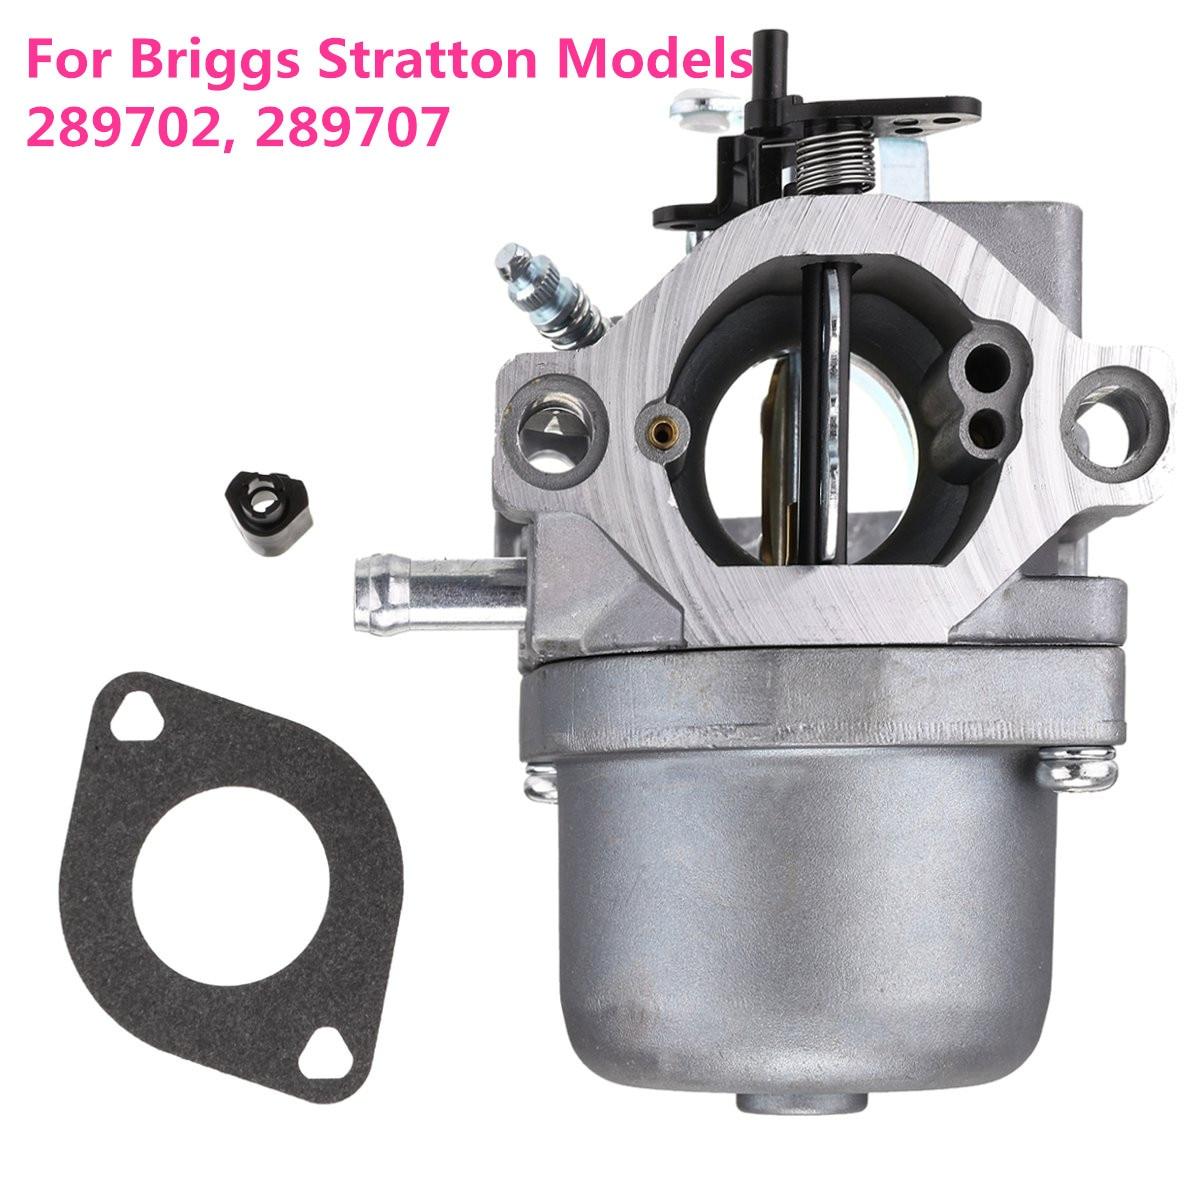 Carburador Carb Para Briggs & Stratton 799728 498027 498231 499161 799728 289702